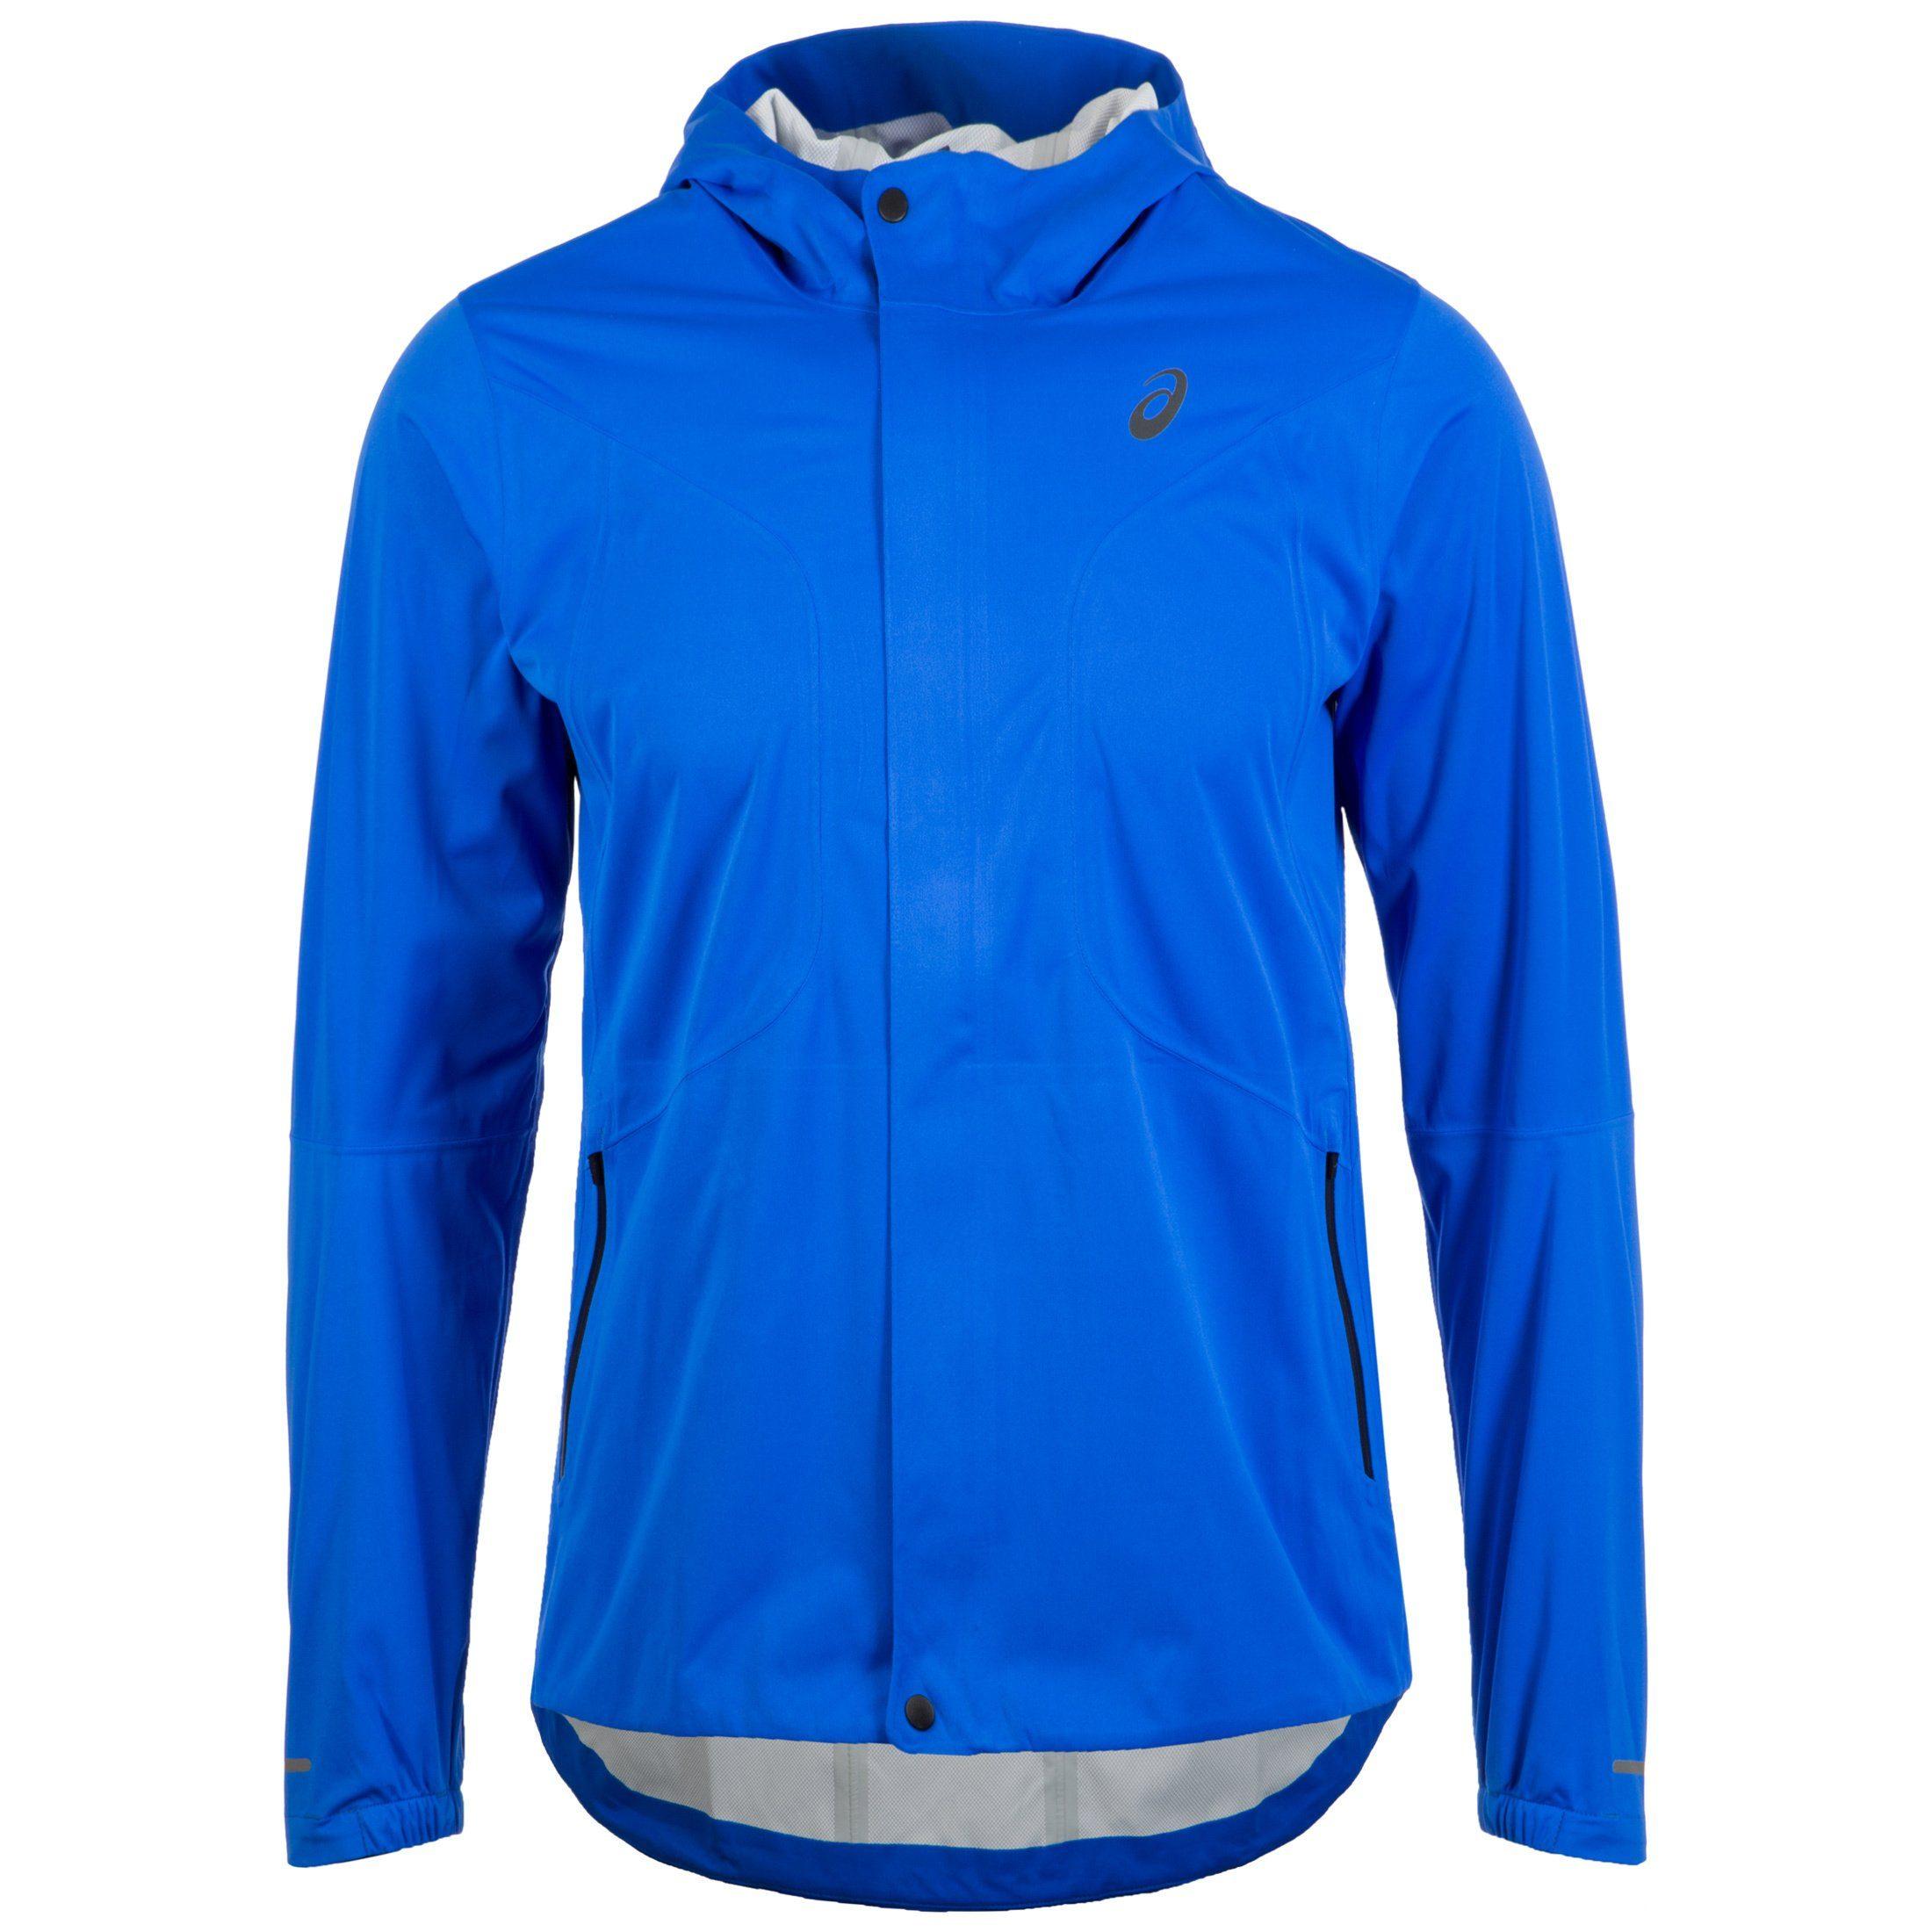 Asics Laufjacke Accelerate | Sportbekleidung > Sportjacken > Laufjacken | Blau | Asics